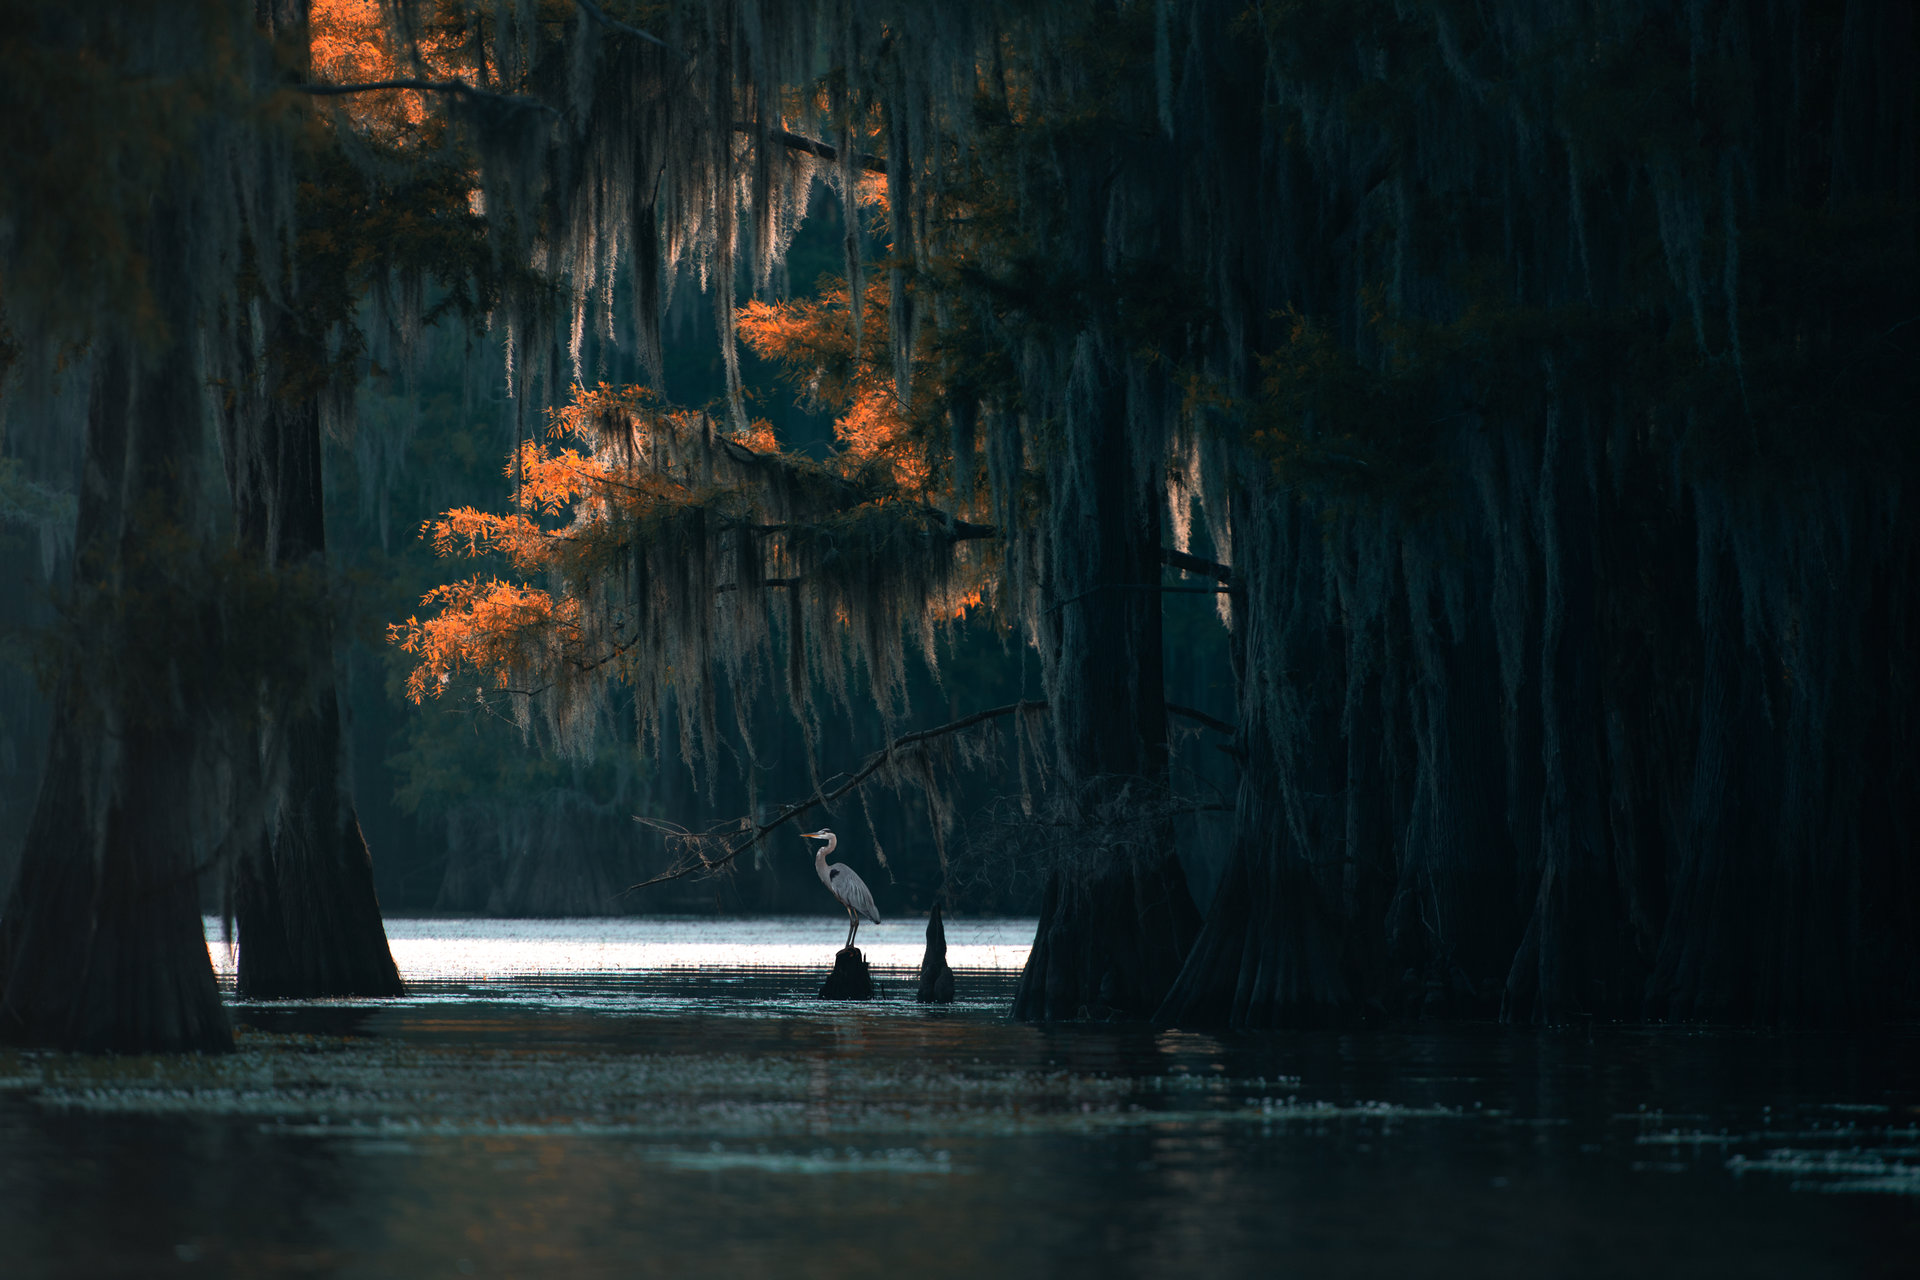 Photo in Landscape | Author Zhoro  - HITTHEROAD | PHOTO FORUM